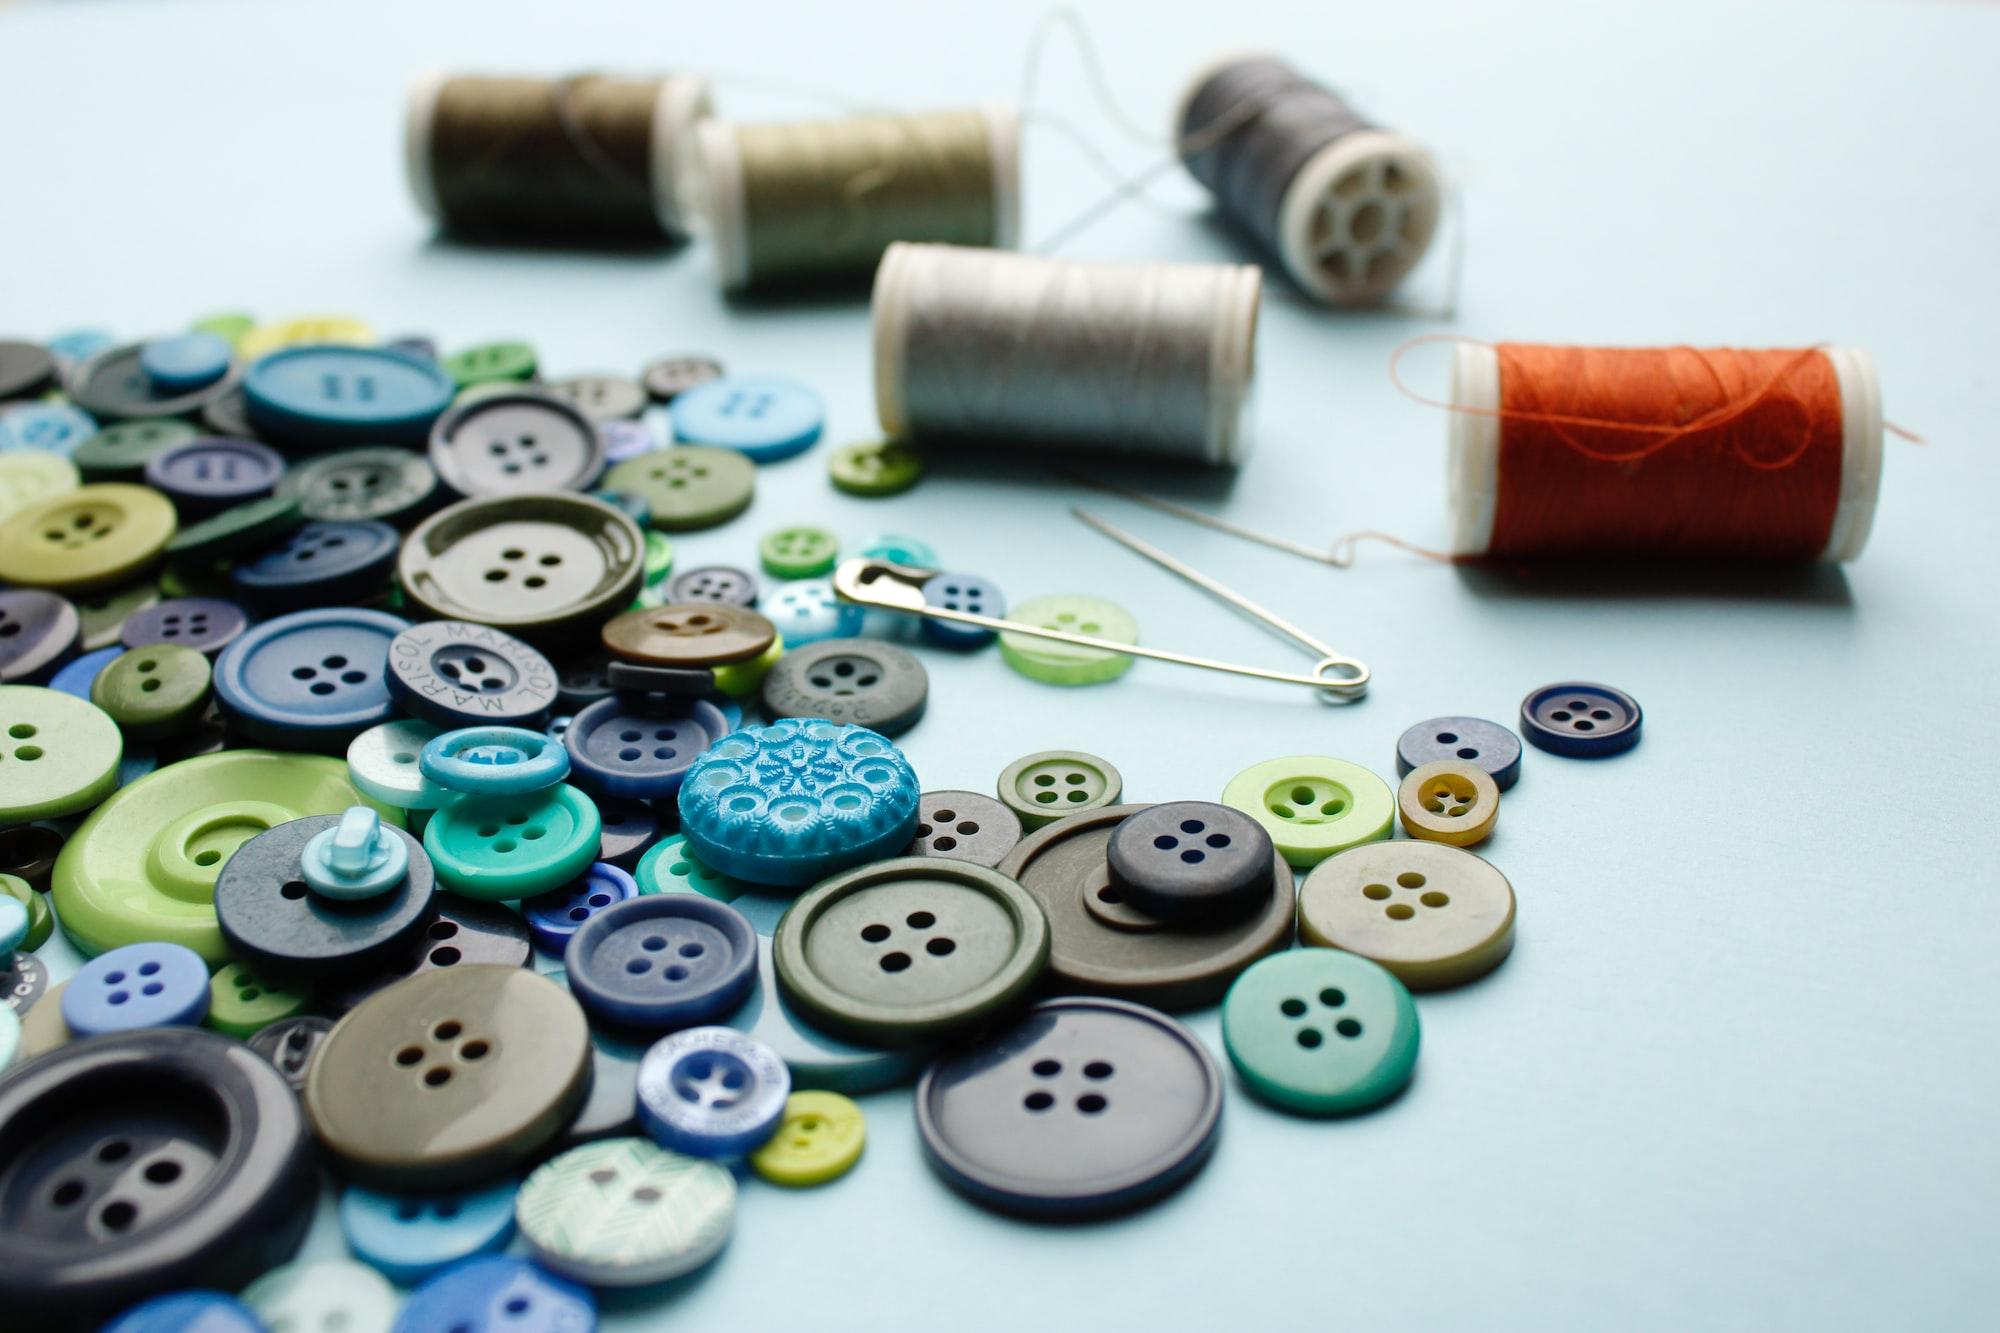 Top 10 Best Sewing Classes in Brighton